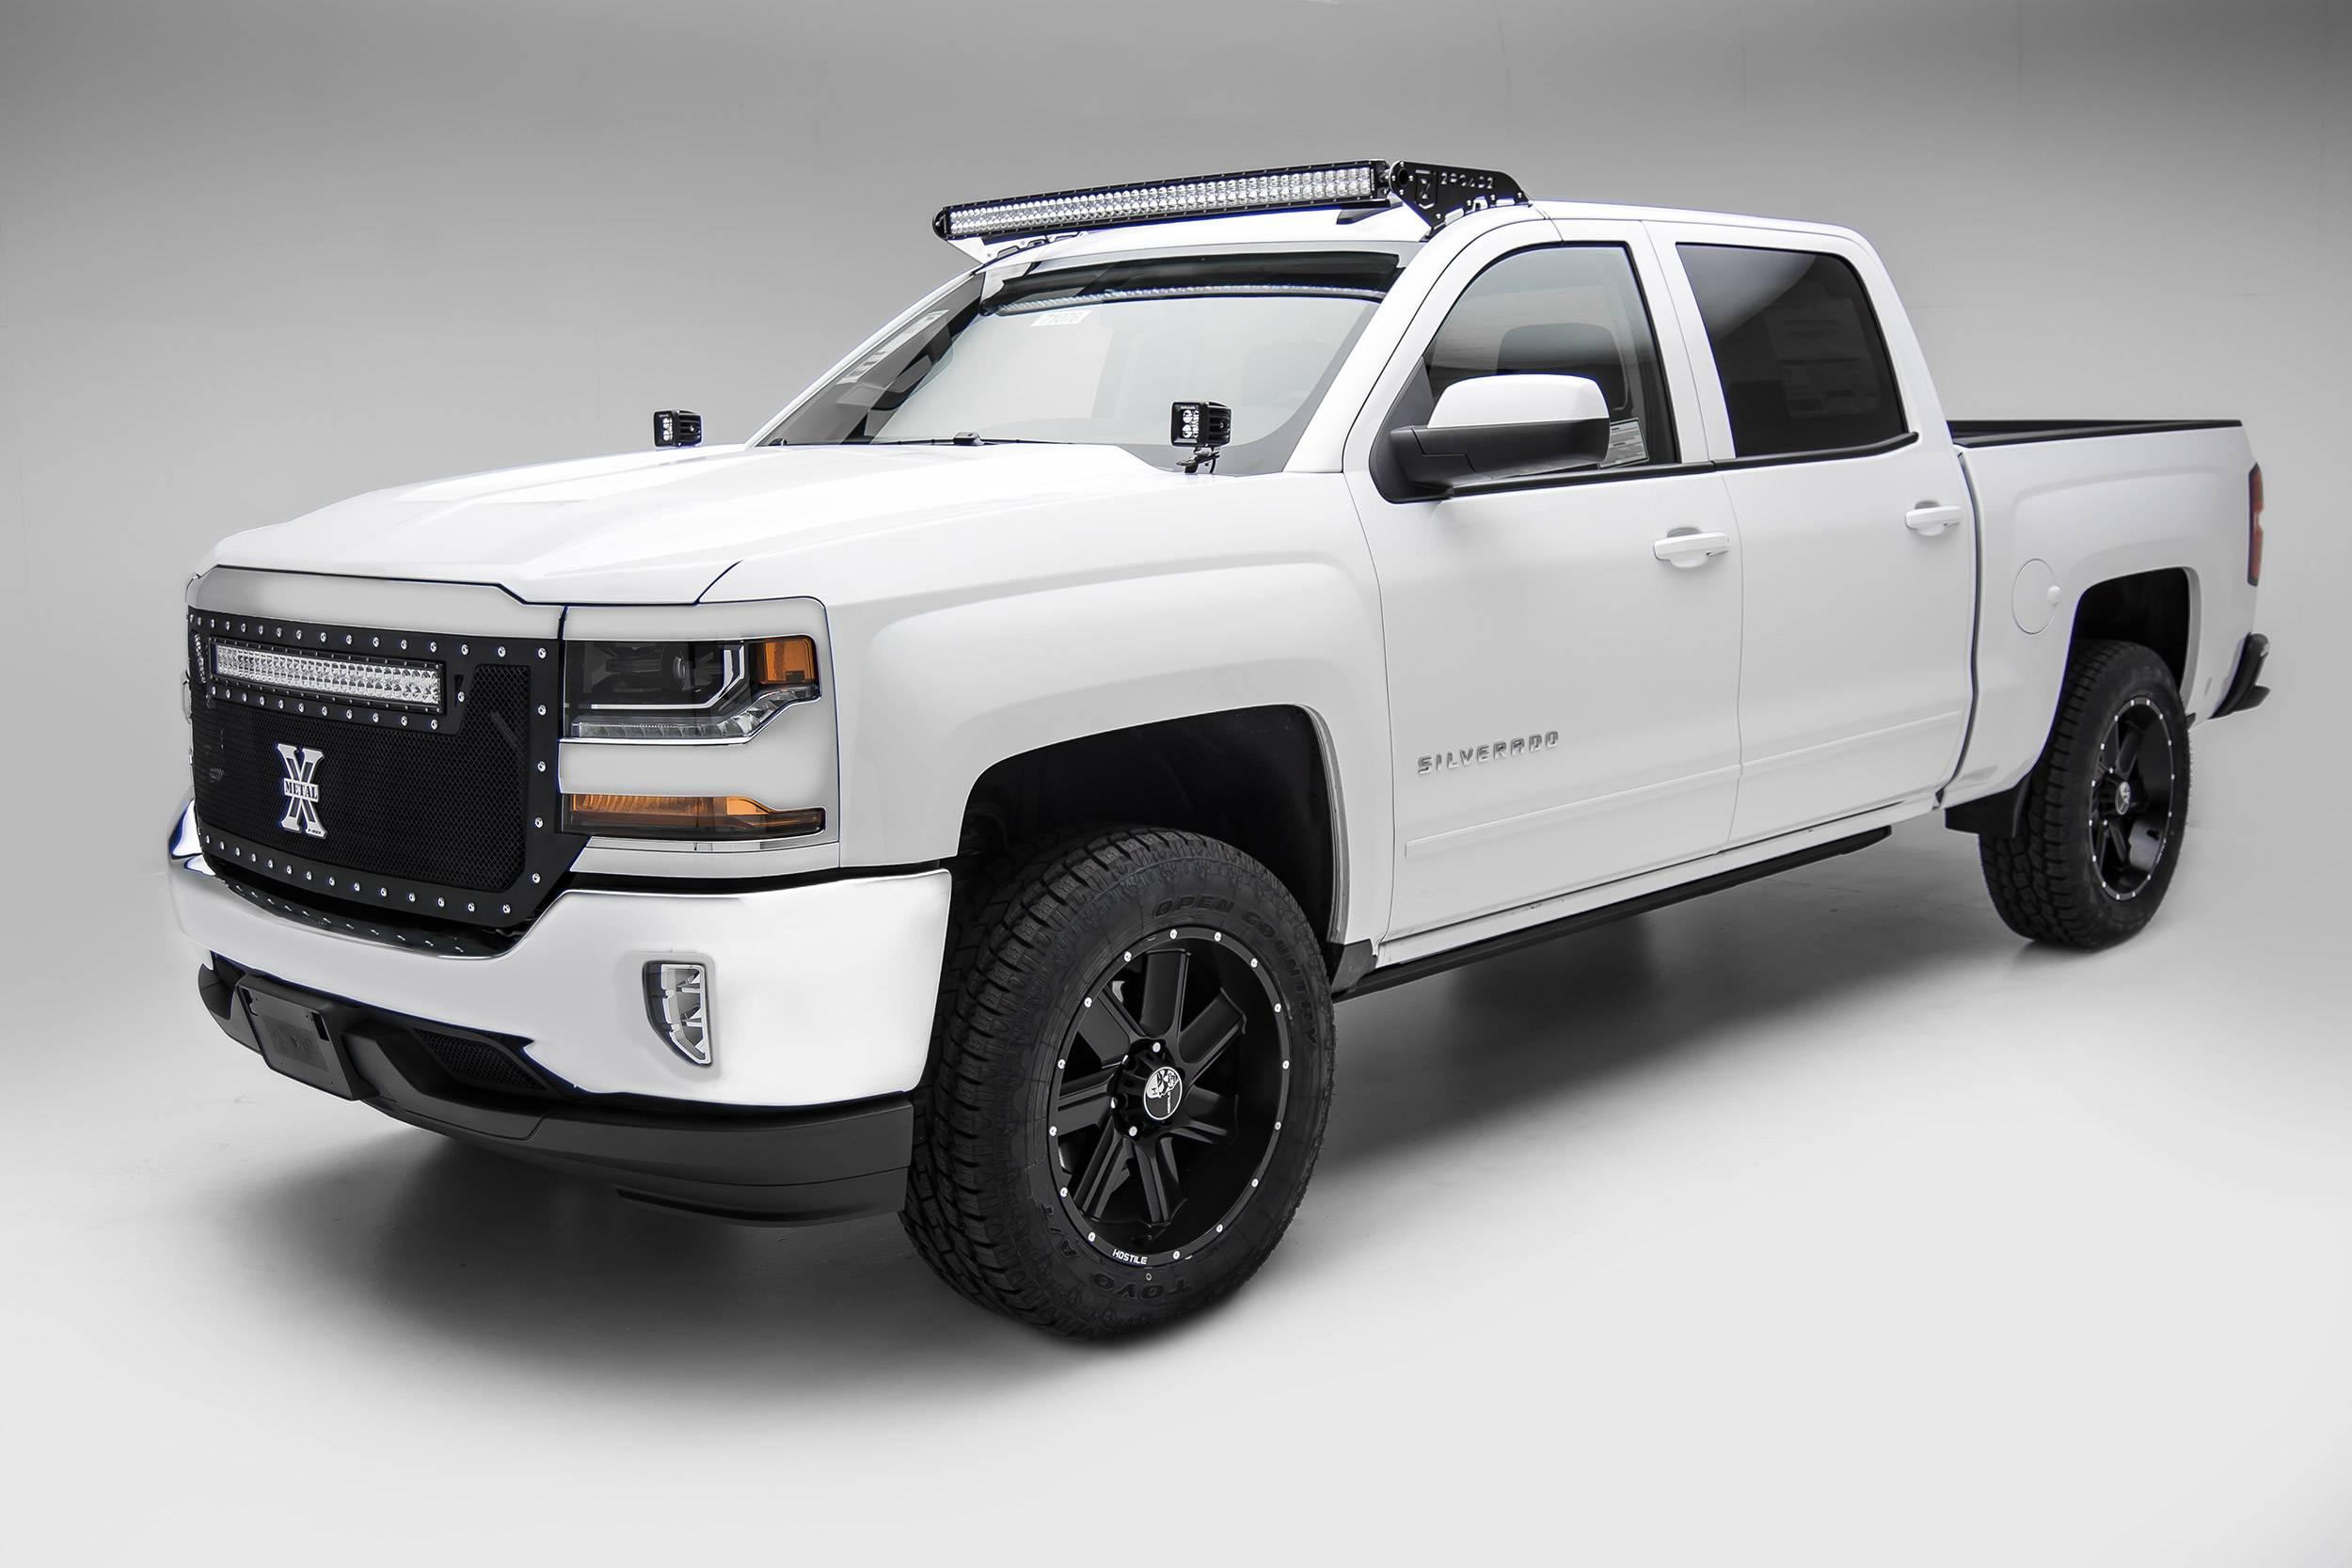 ZROADZ                                             - Silverado, Sierra Front Roof LED Bracket to mount 50 Inch Curved LED Light Bar - PN #Z332081